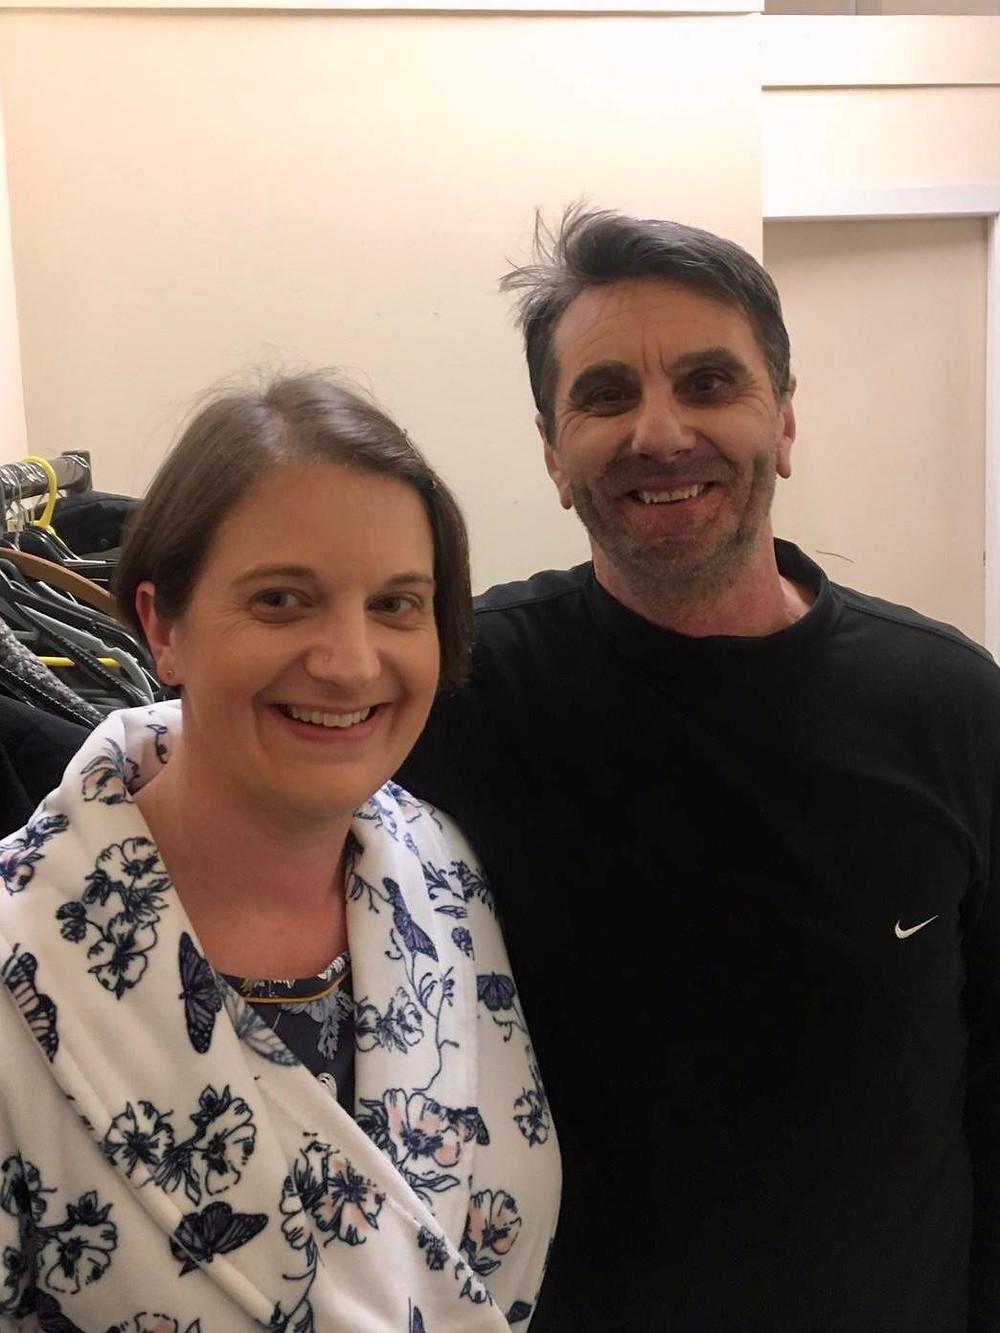 Anna Foran (Fiona) & Andy Barr (Bone), 6.3.20